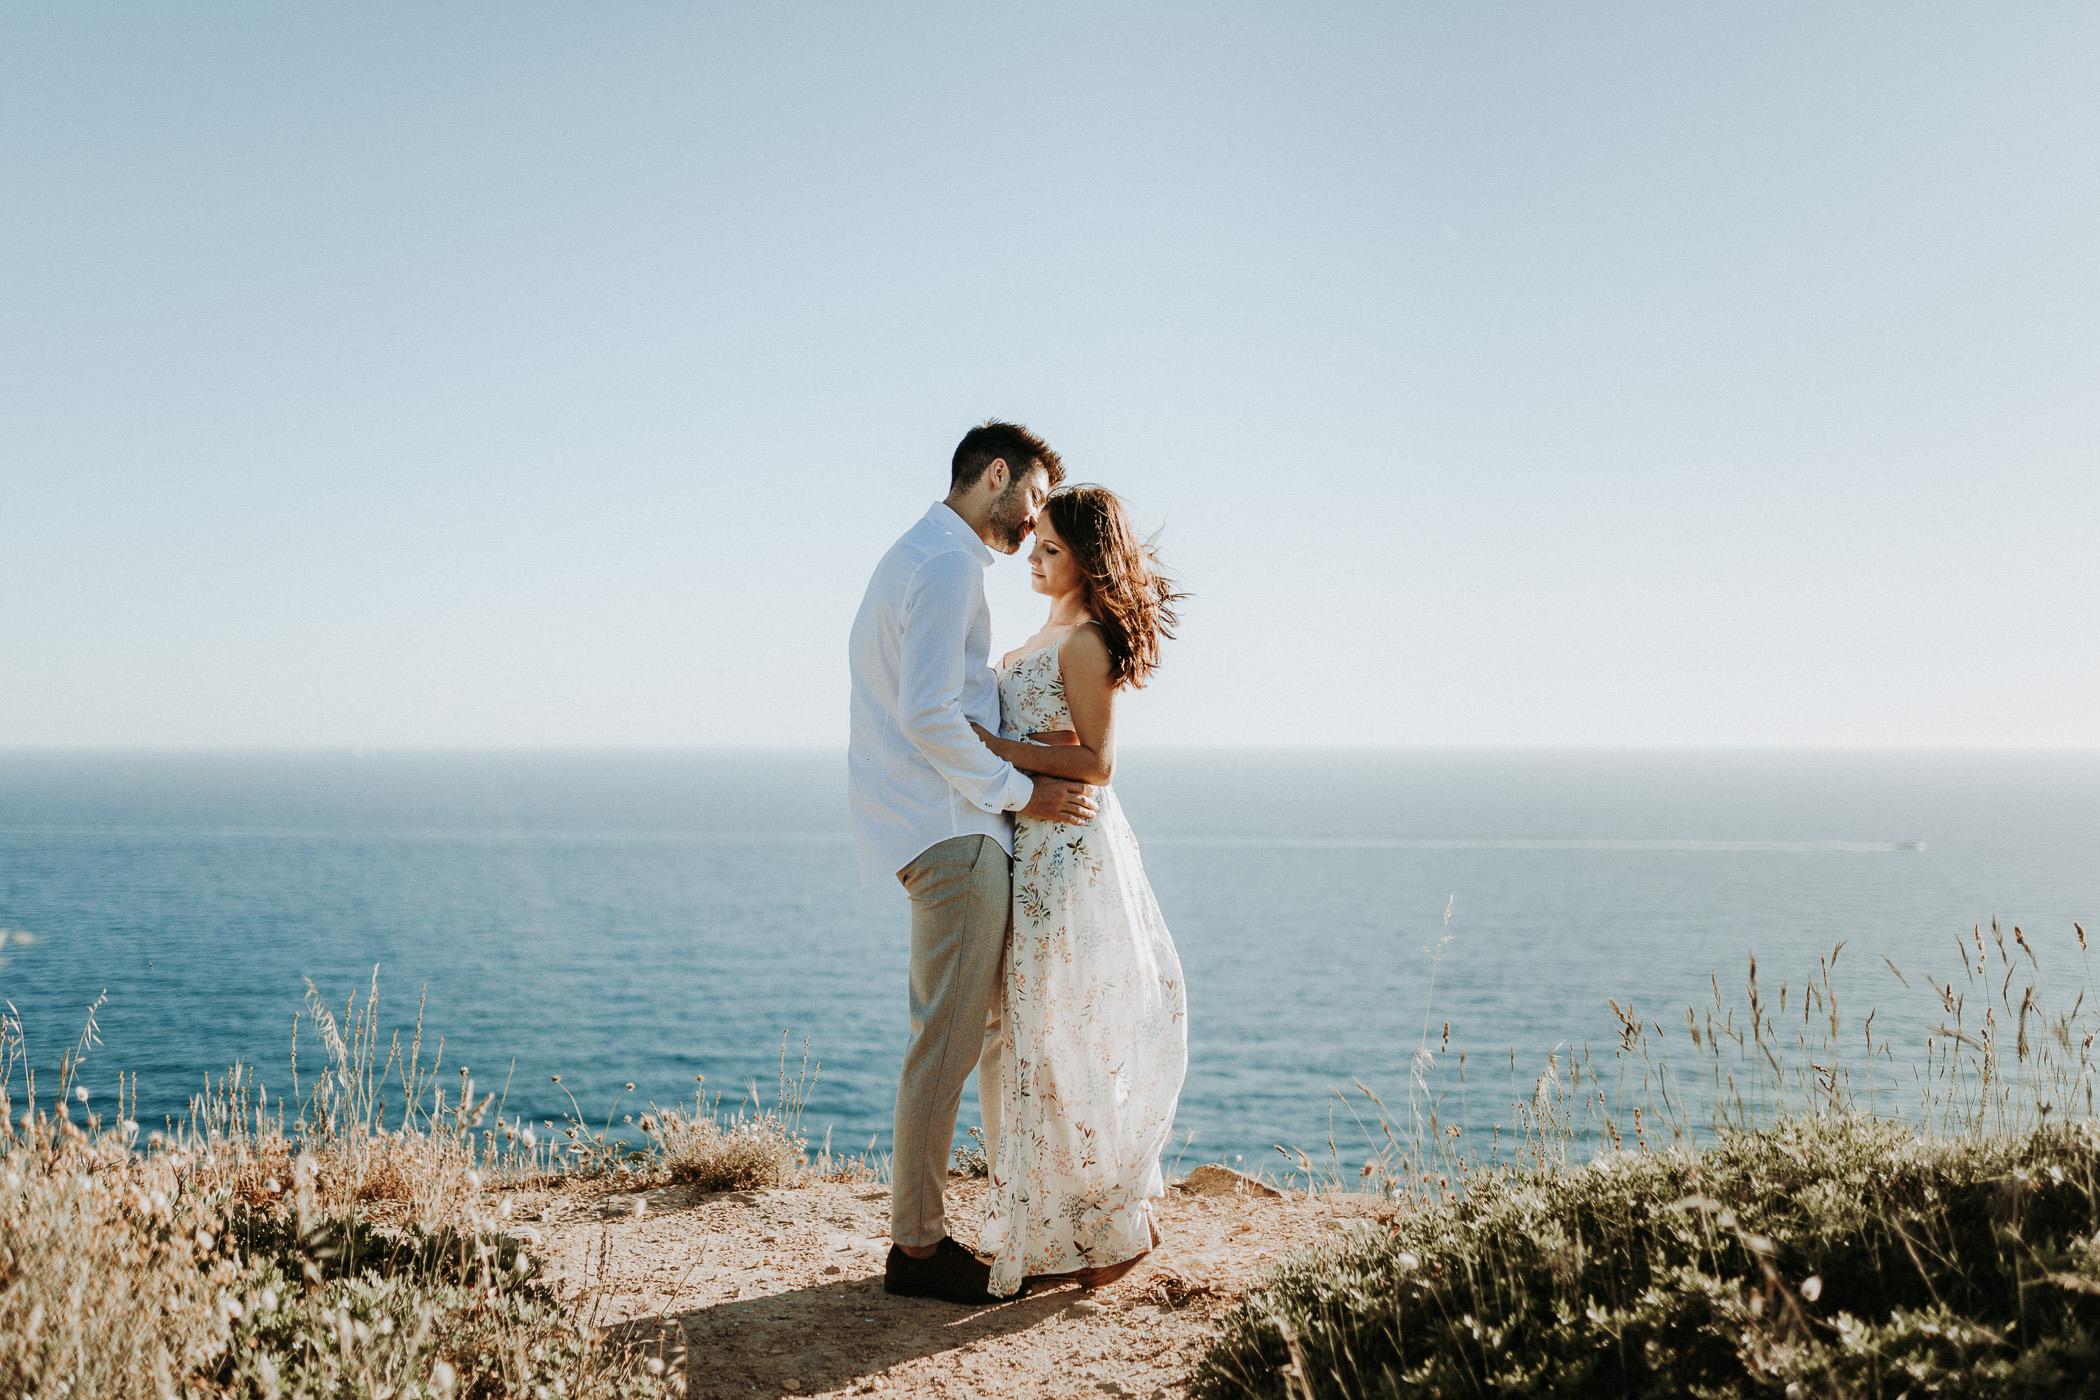 DanielaMarquardtPhotography_wedding_elopement_mallorca_spain_calapi_palma_lauraandtoni_266